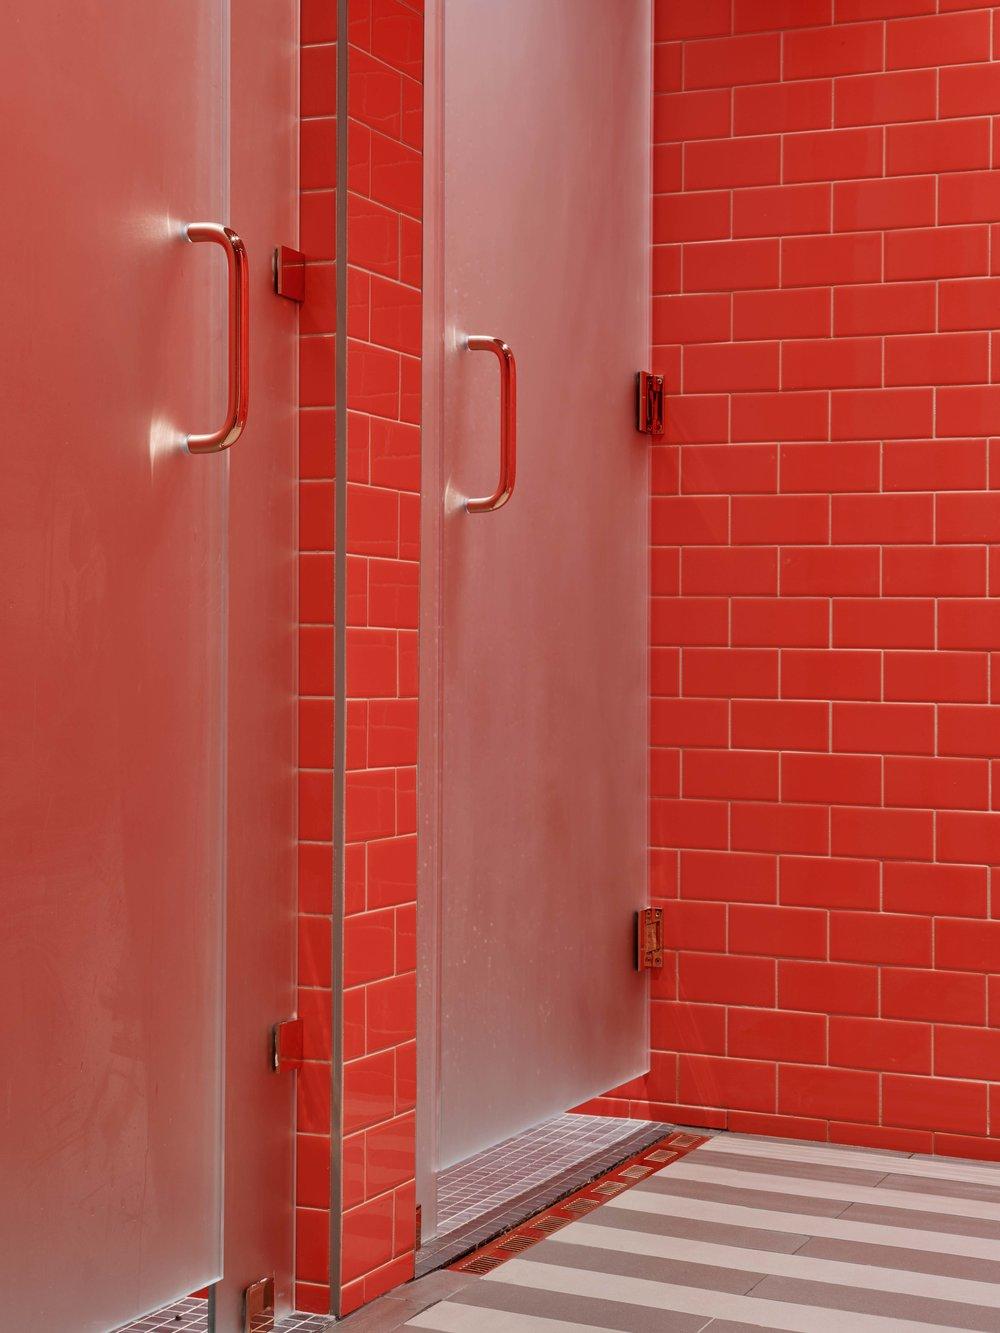 Industry City Athletic Club Locker Room Shower Detail